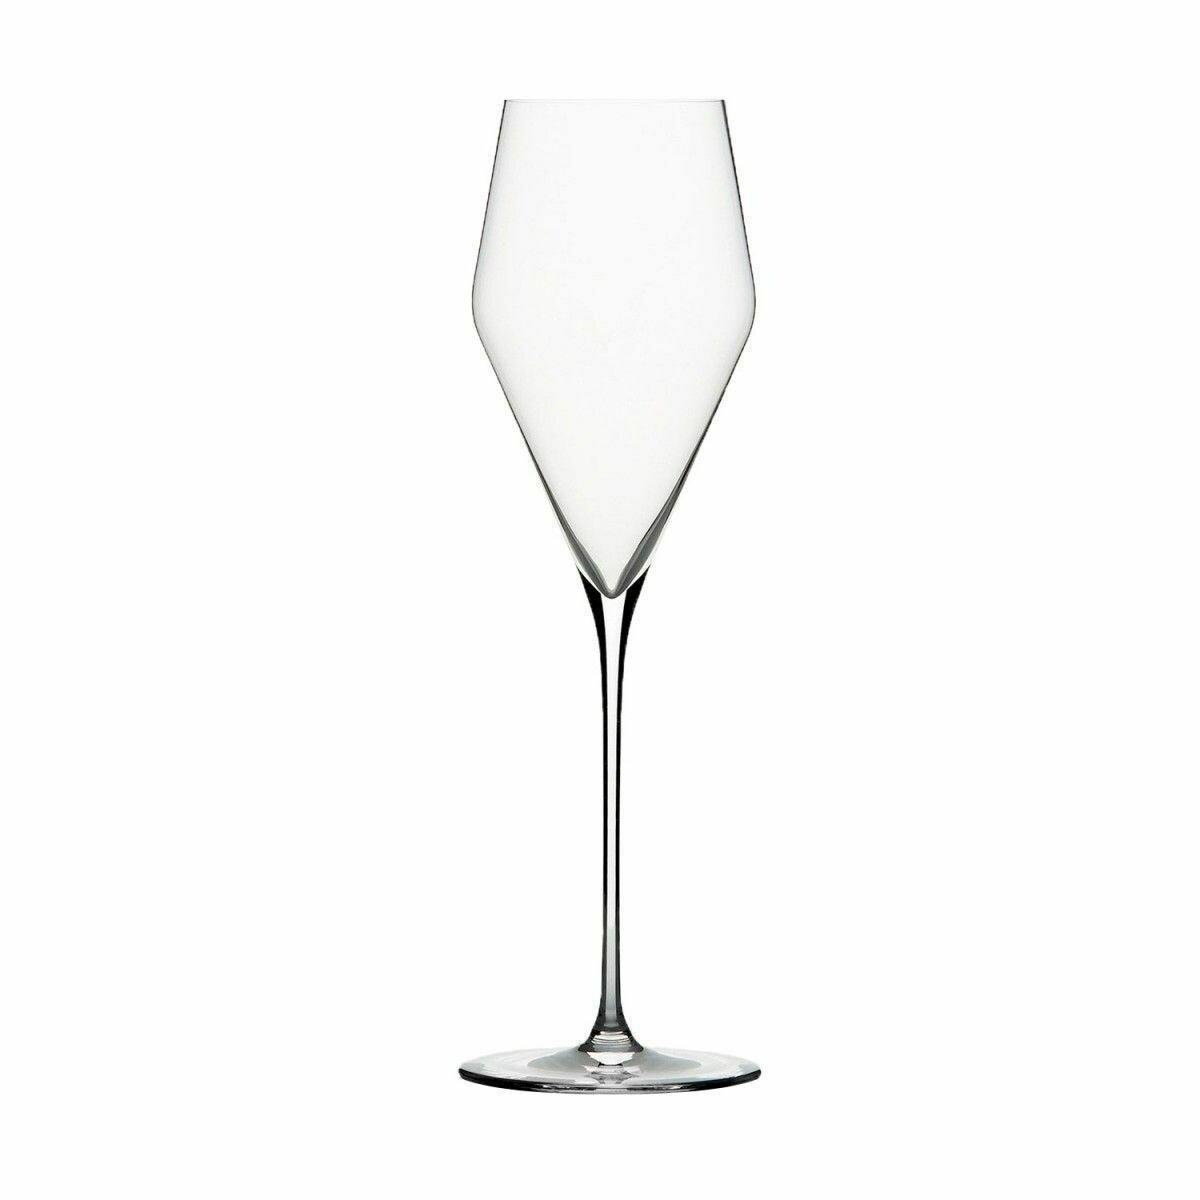 ZALTO DENK'ART Champagne